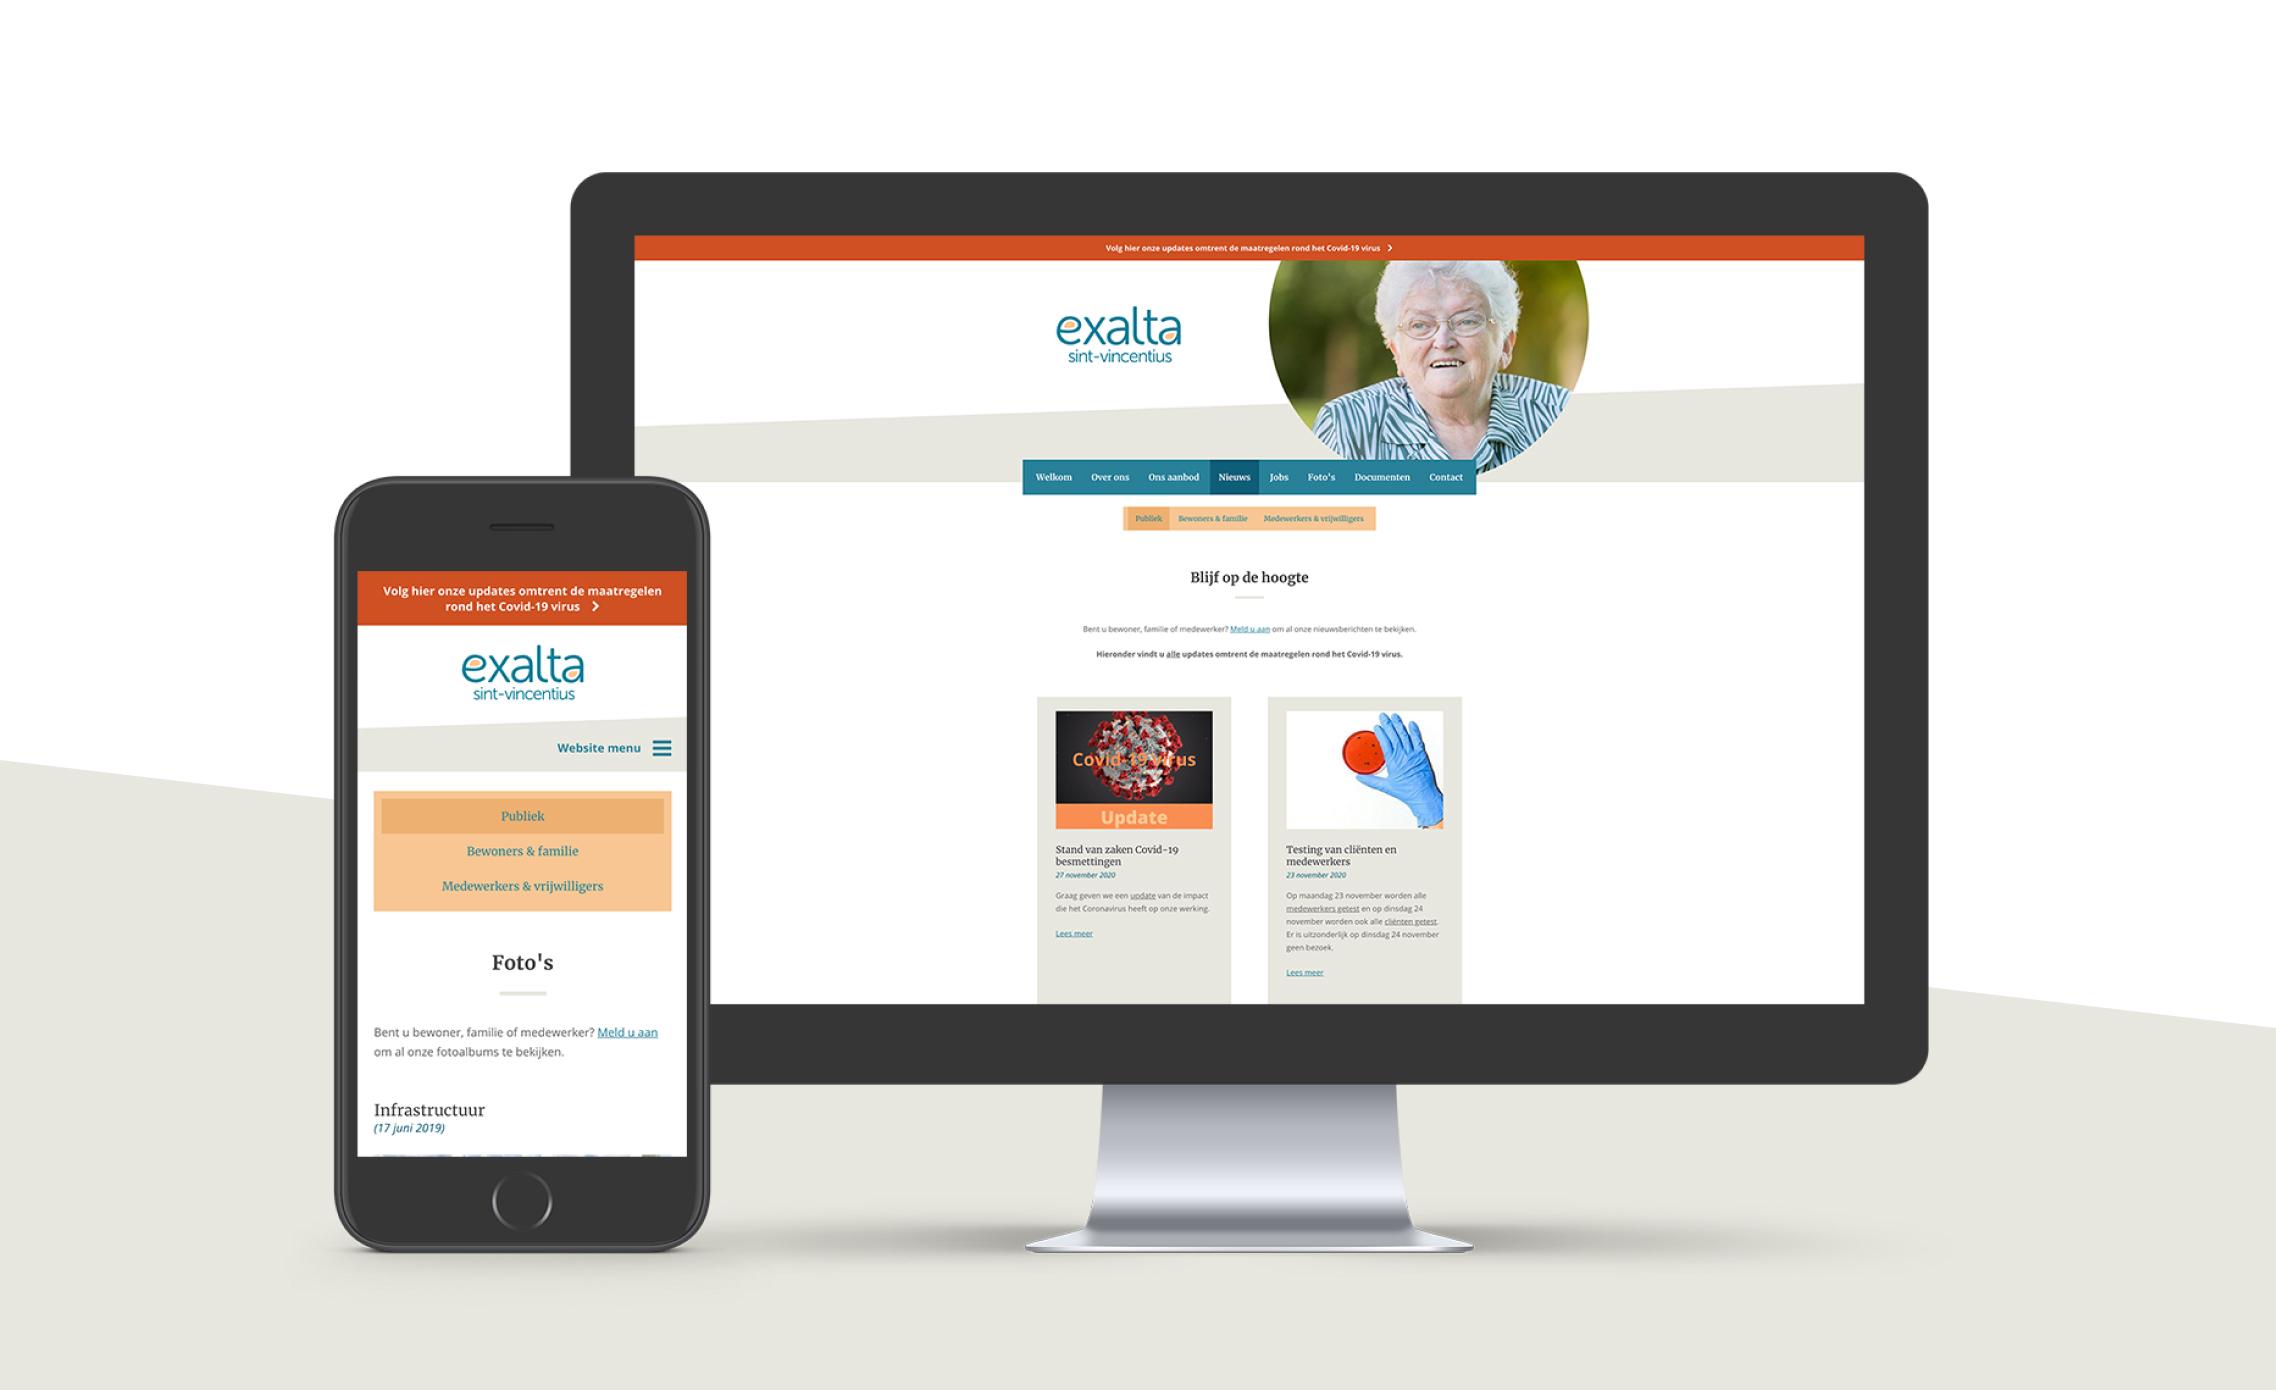 exalta webdesign